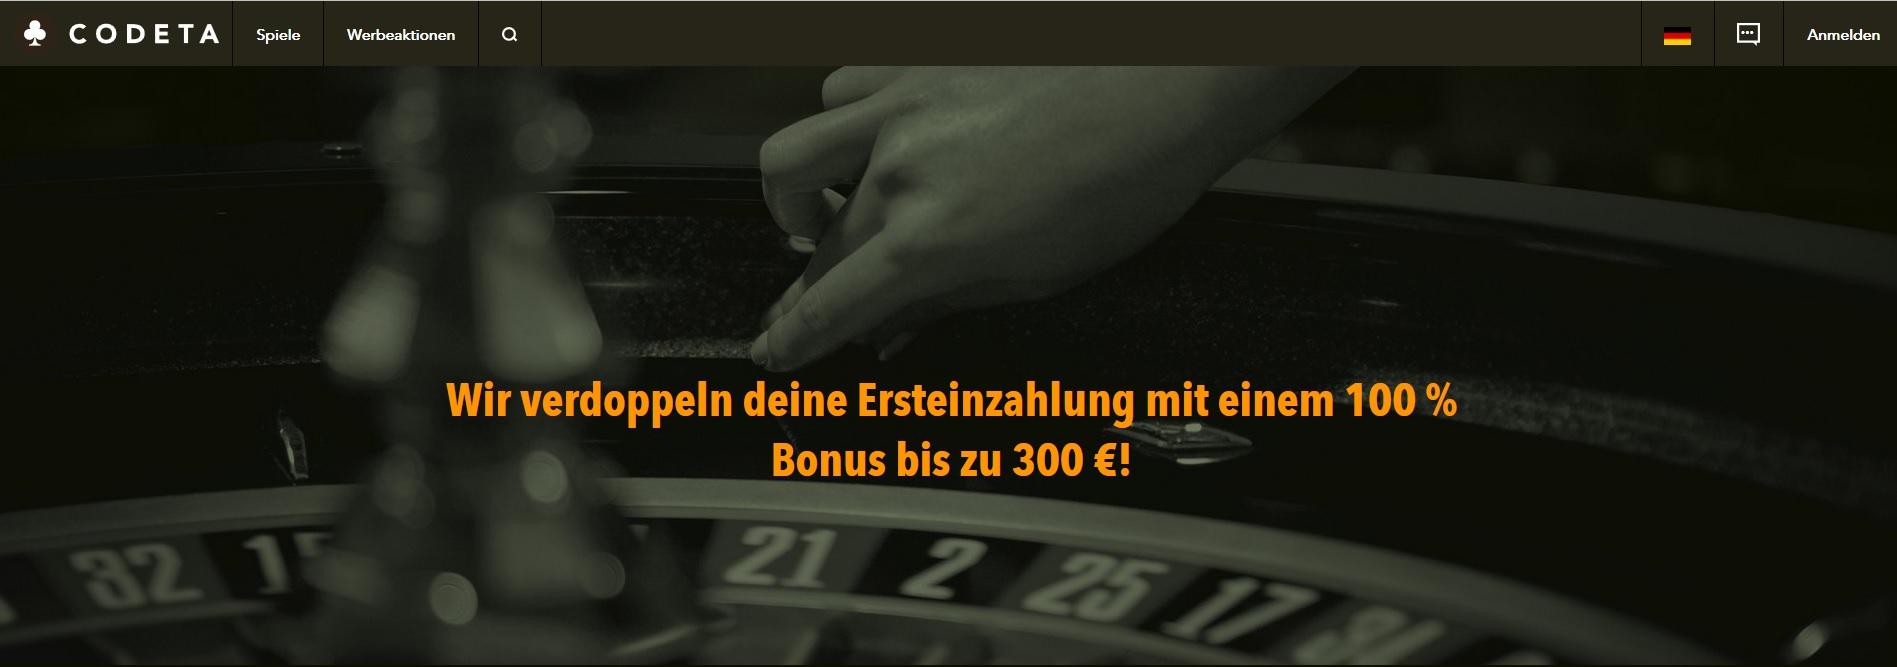 Codeta Casino Bonus